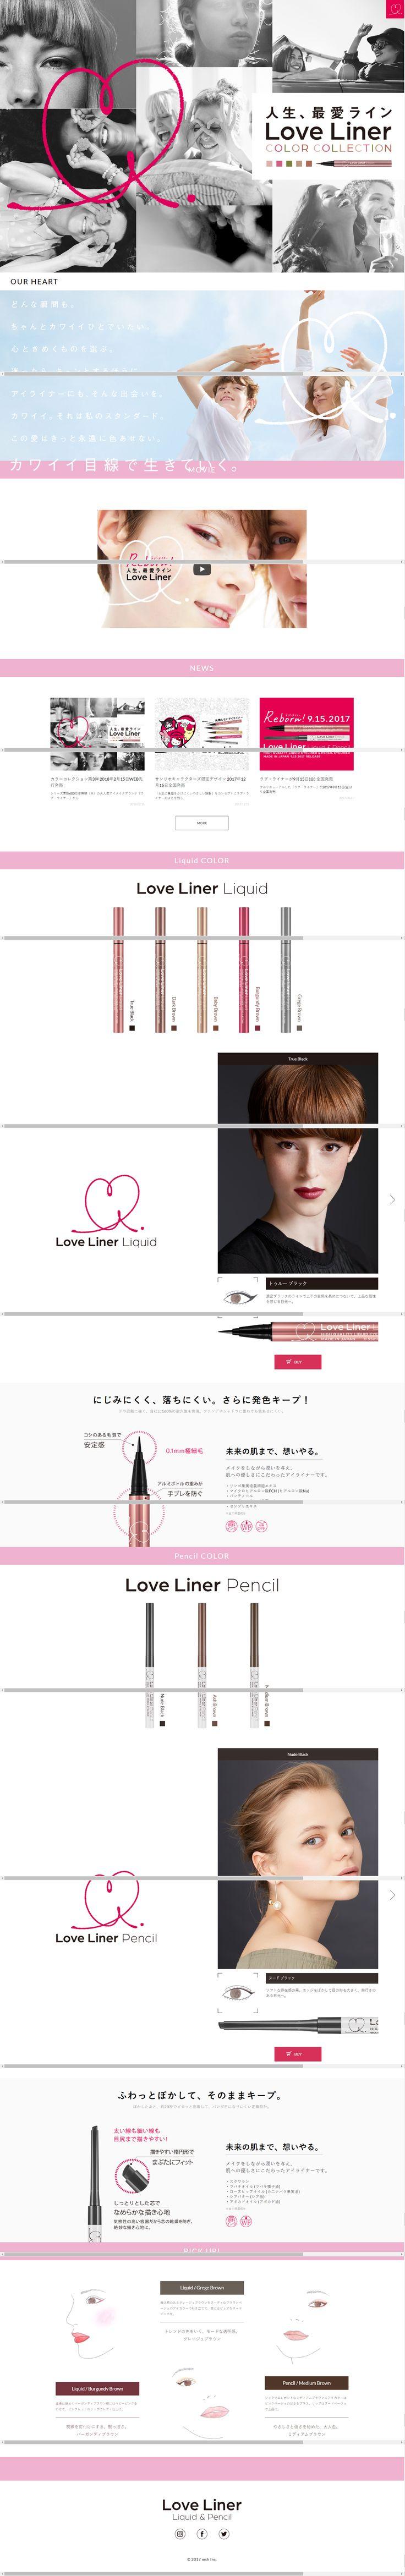 Love Liner ラブ・ライナー オフィシャルサイト